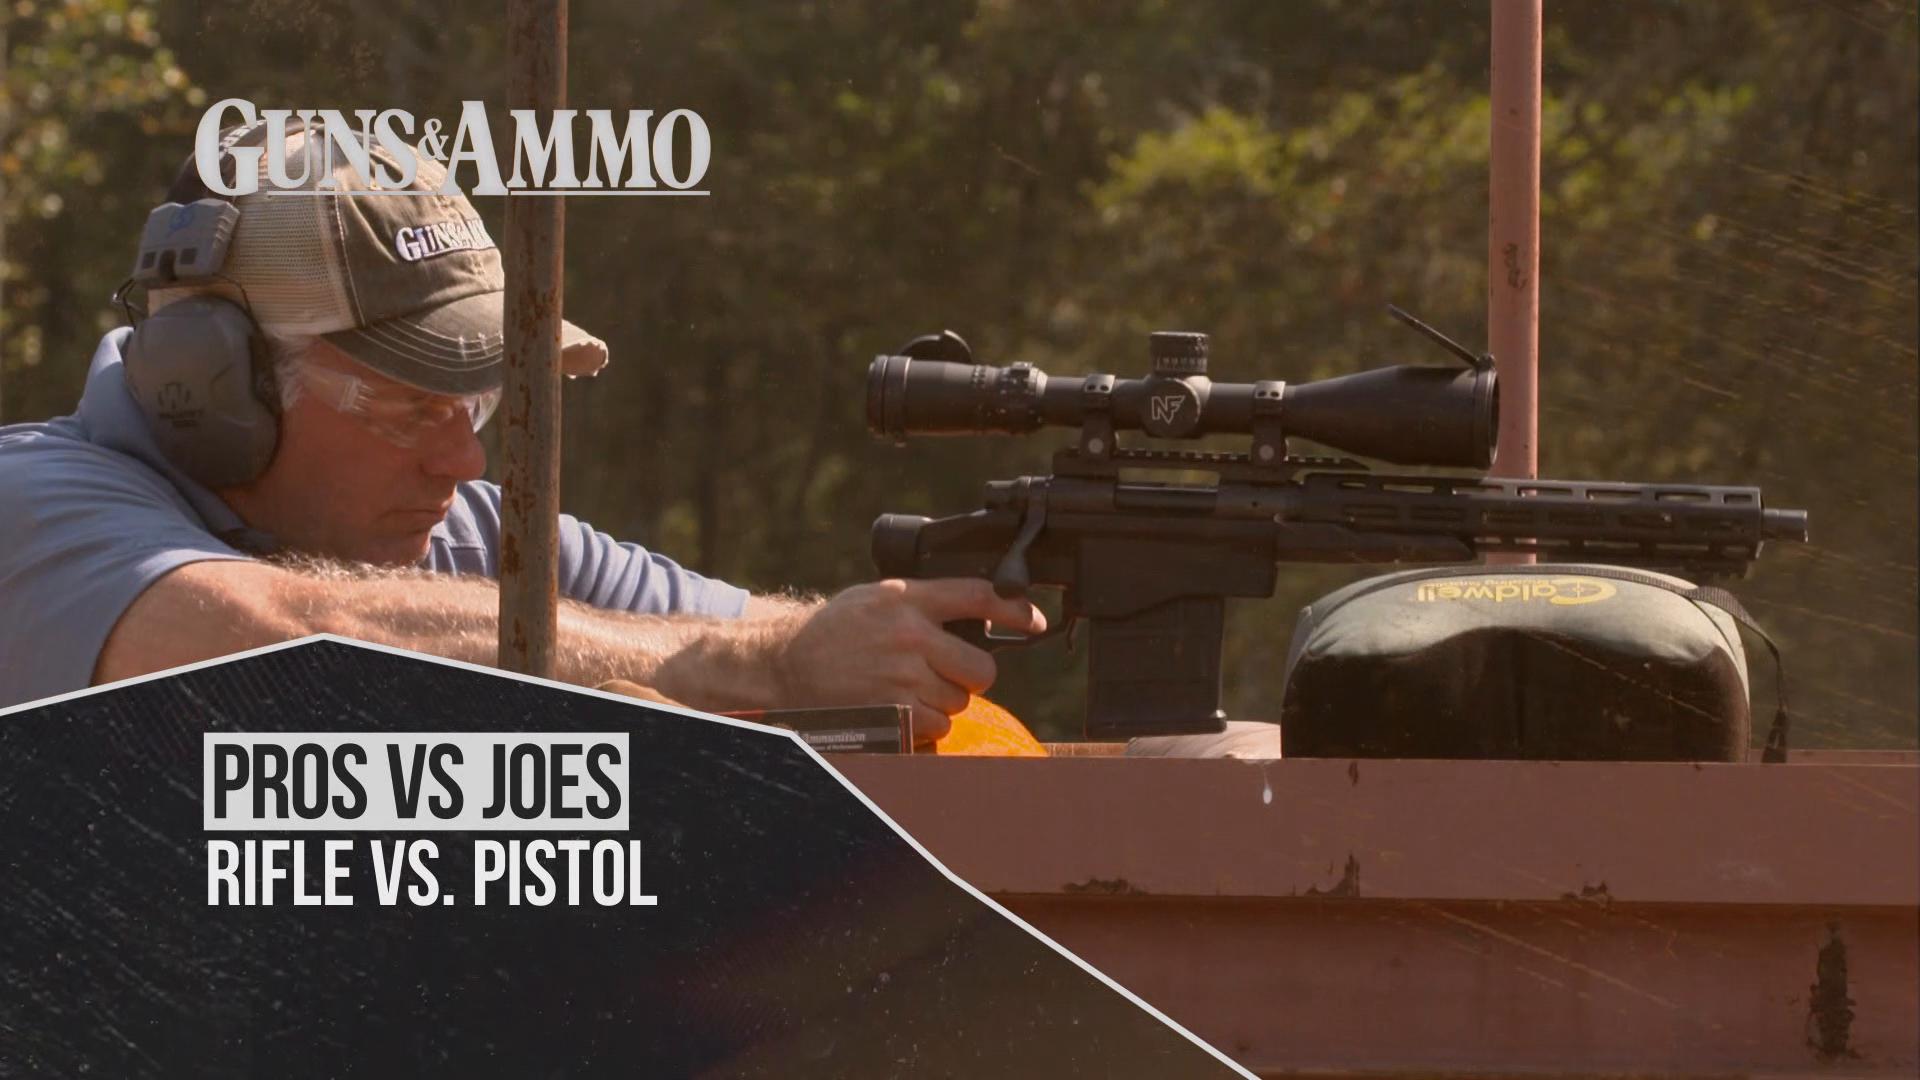 Rifle VS. Pistol